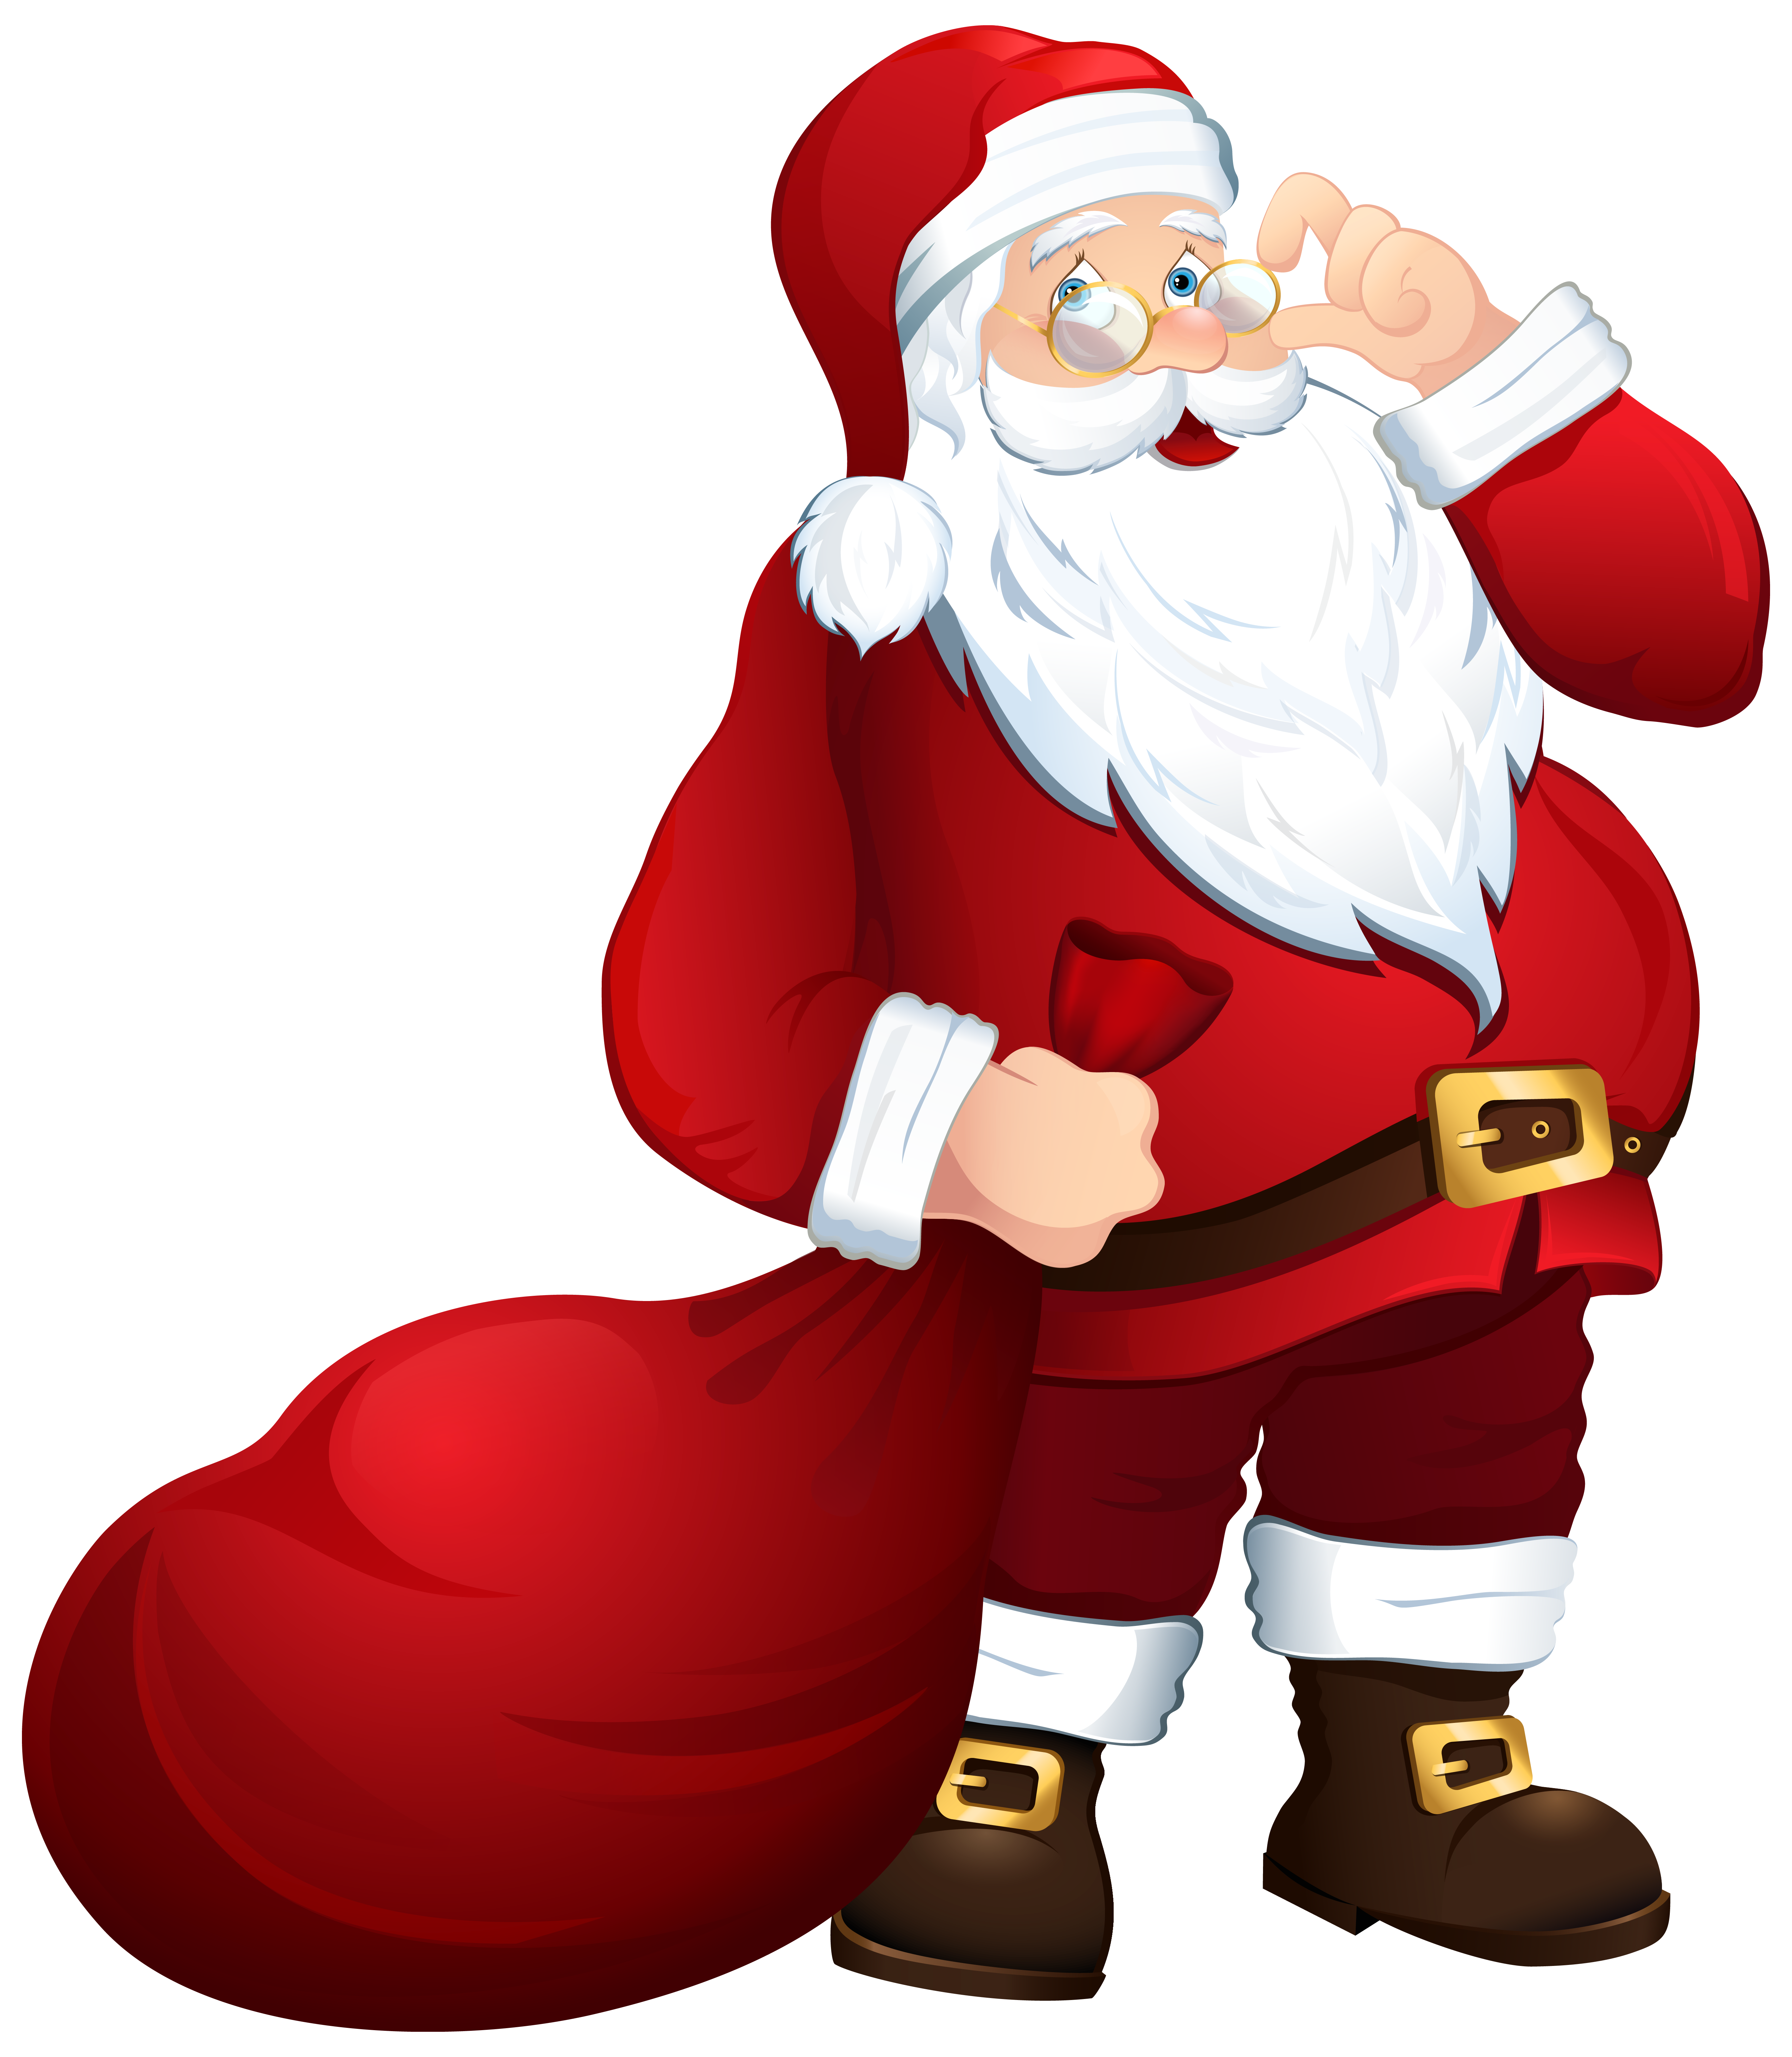 Thanks clipart christmas. Santa claus with bag